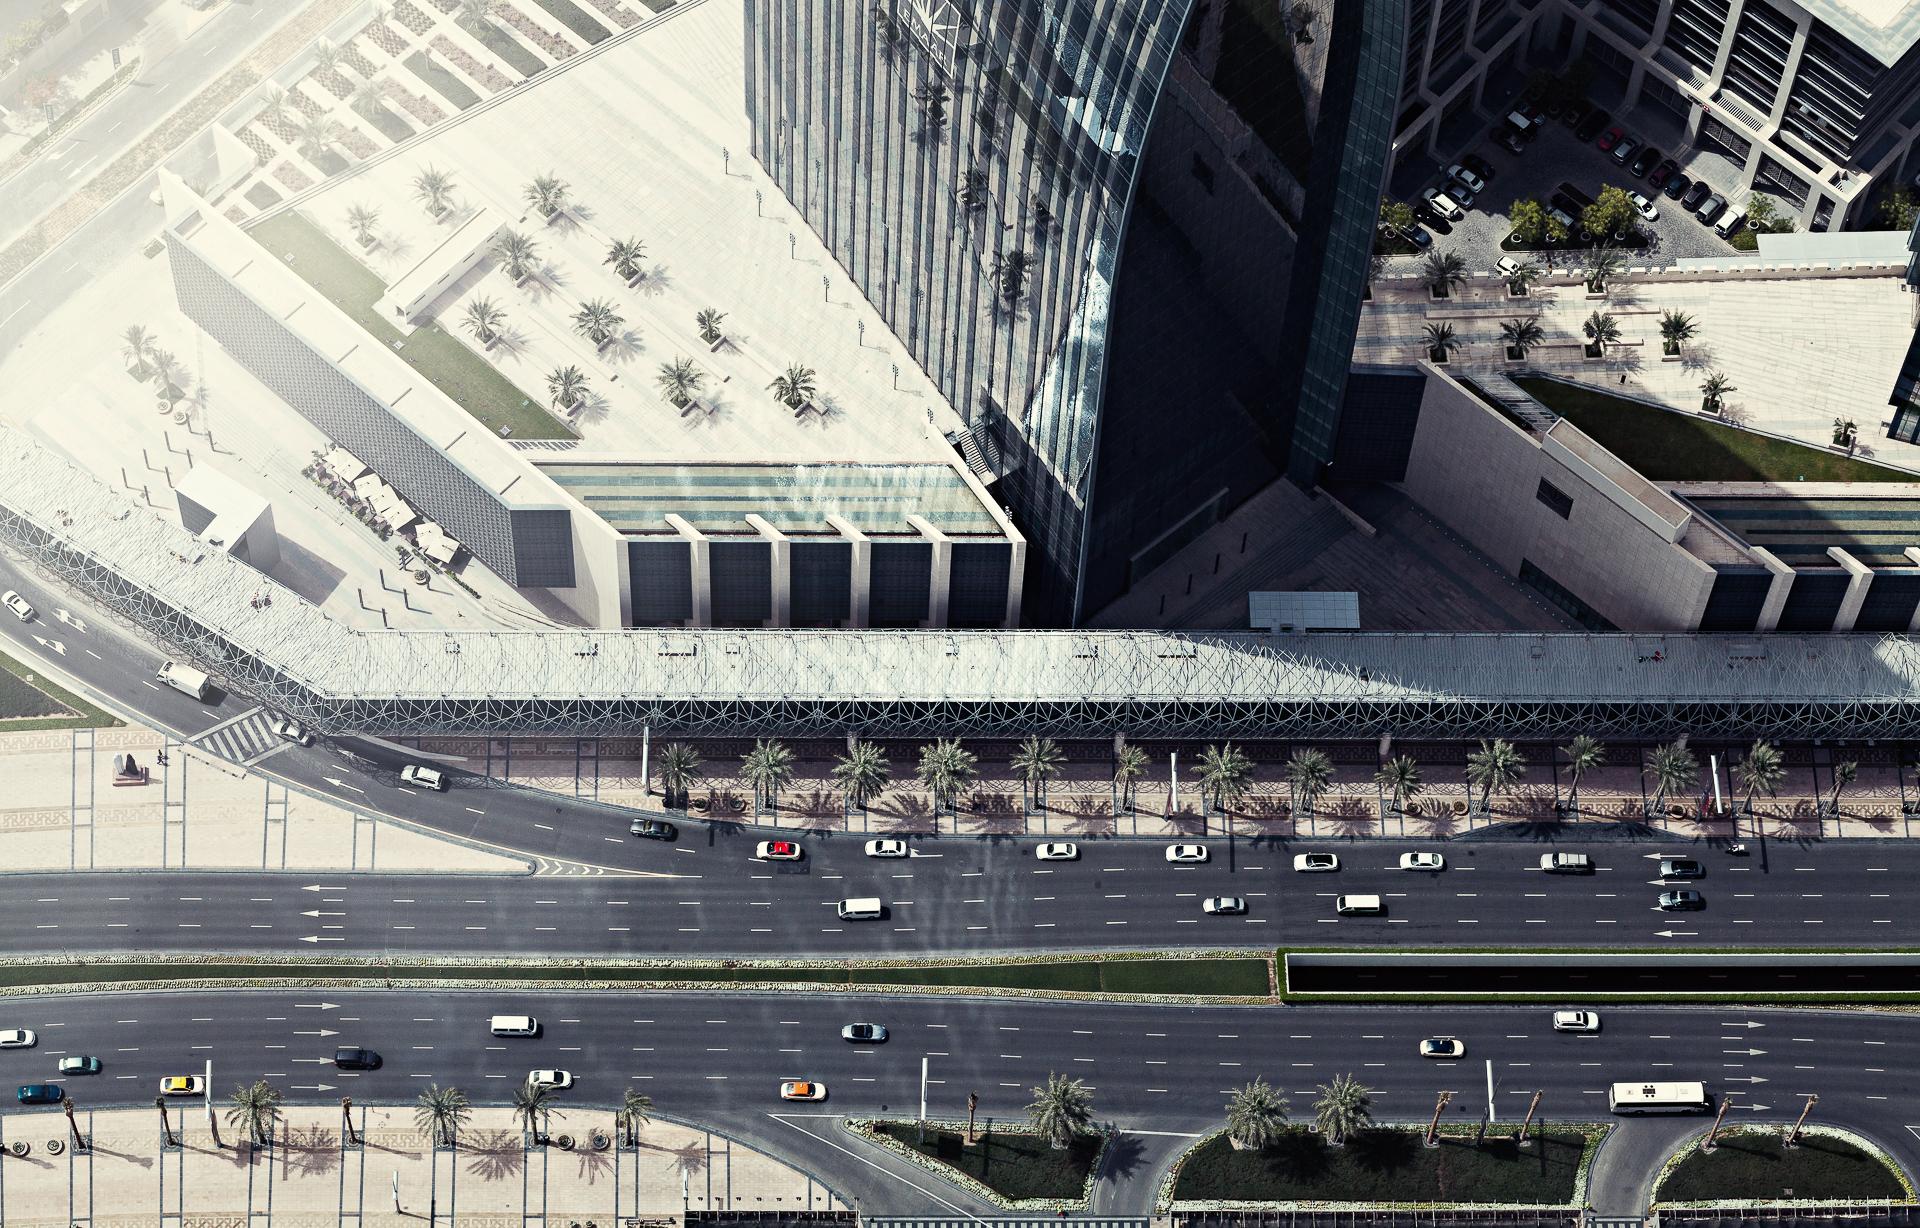 Gökhan_Orhan_Portfolio_Landscape_Dubai-2